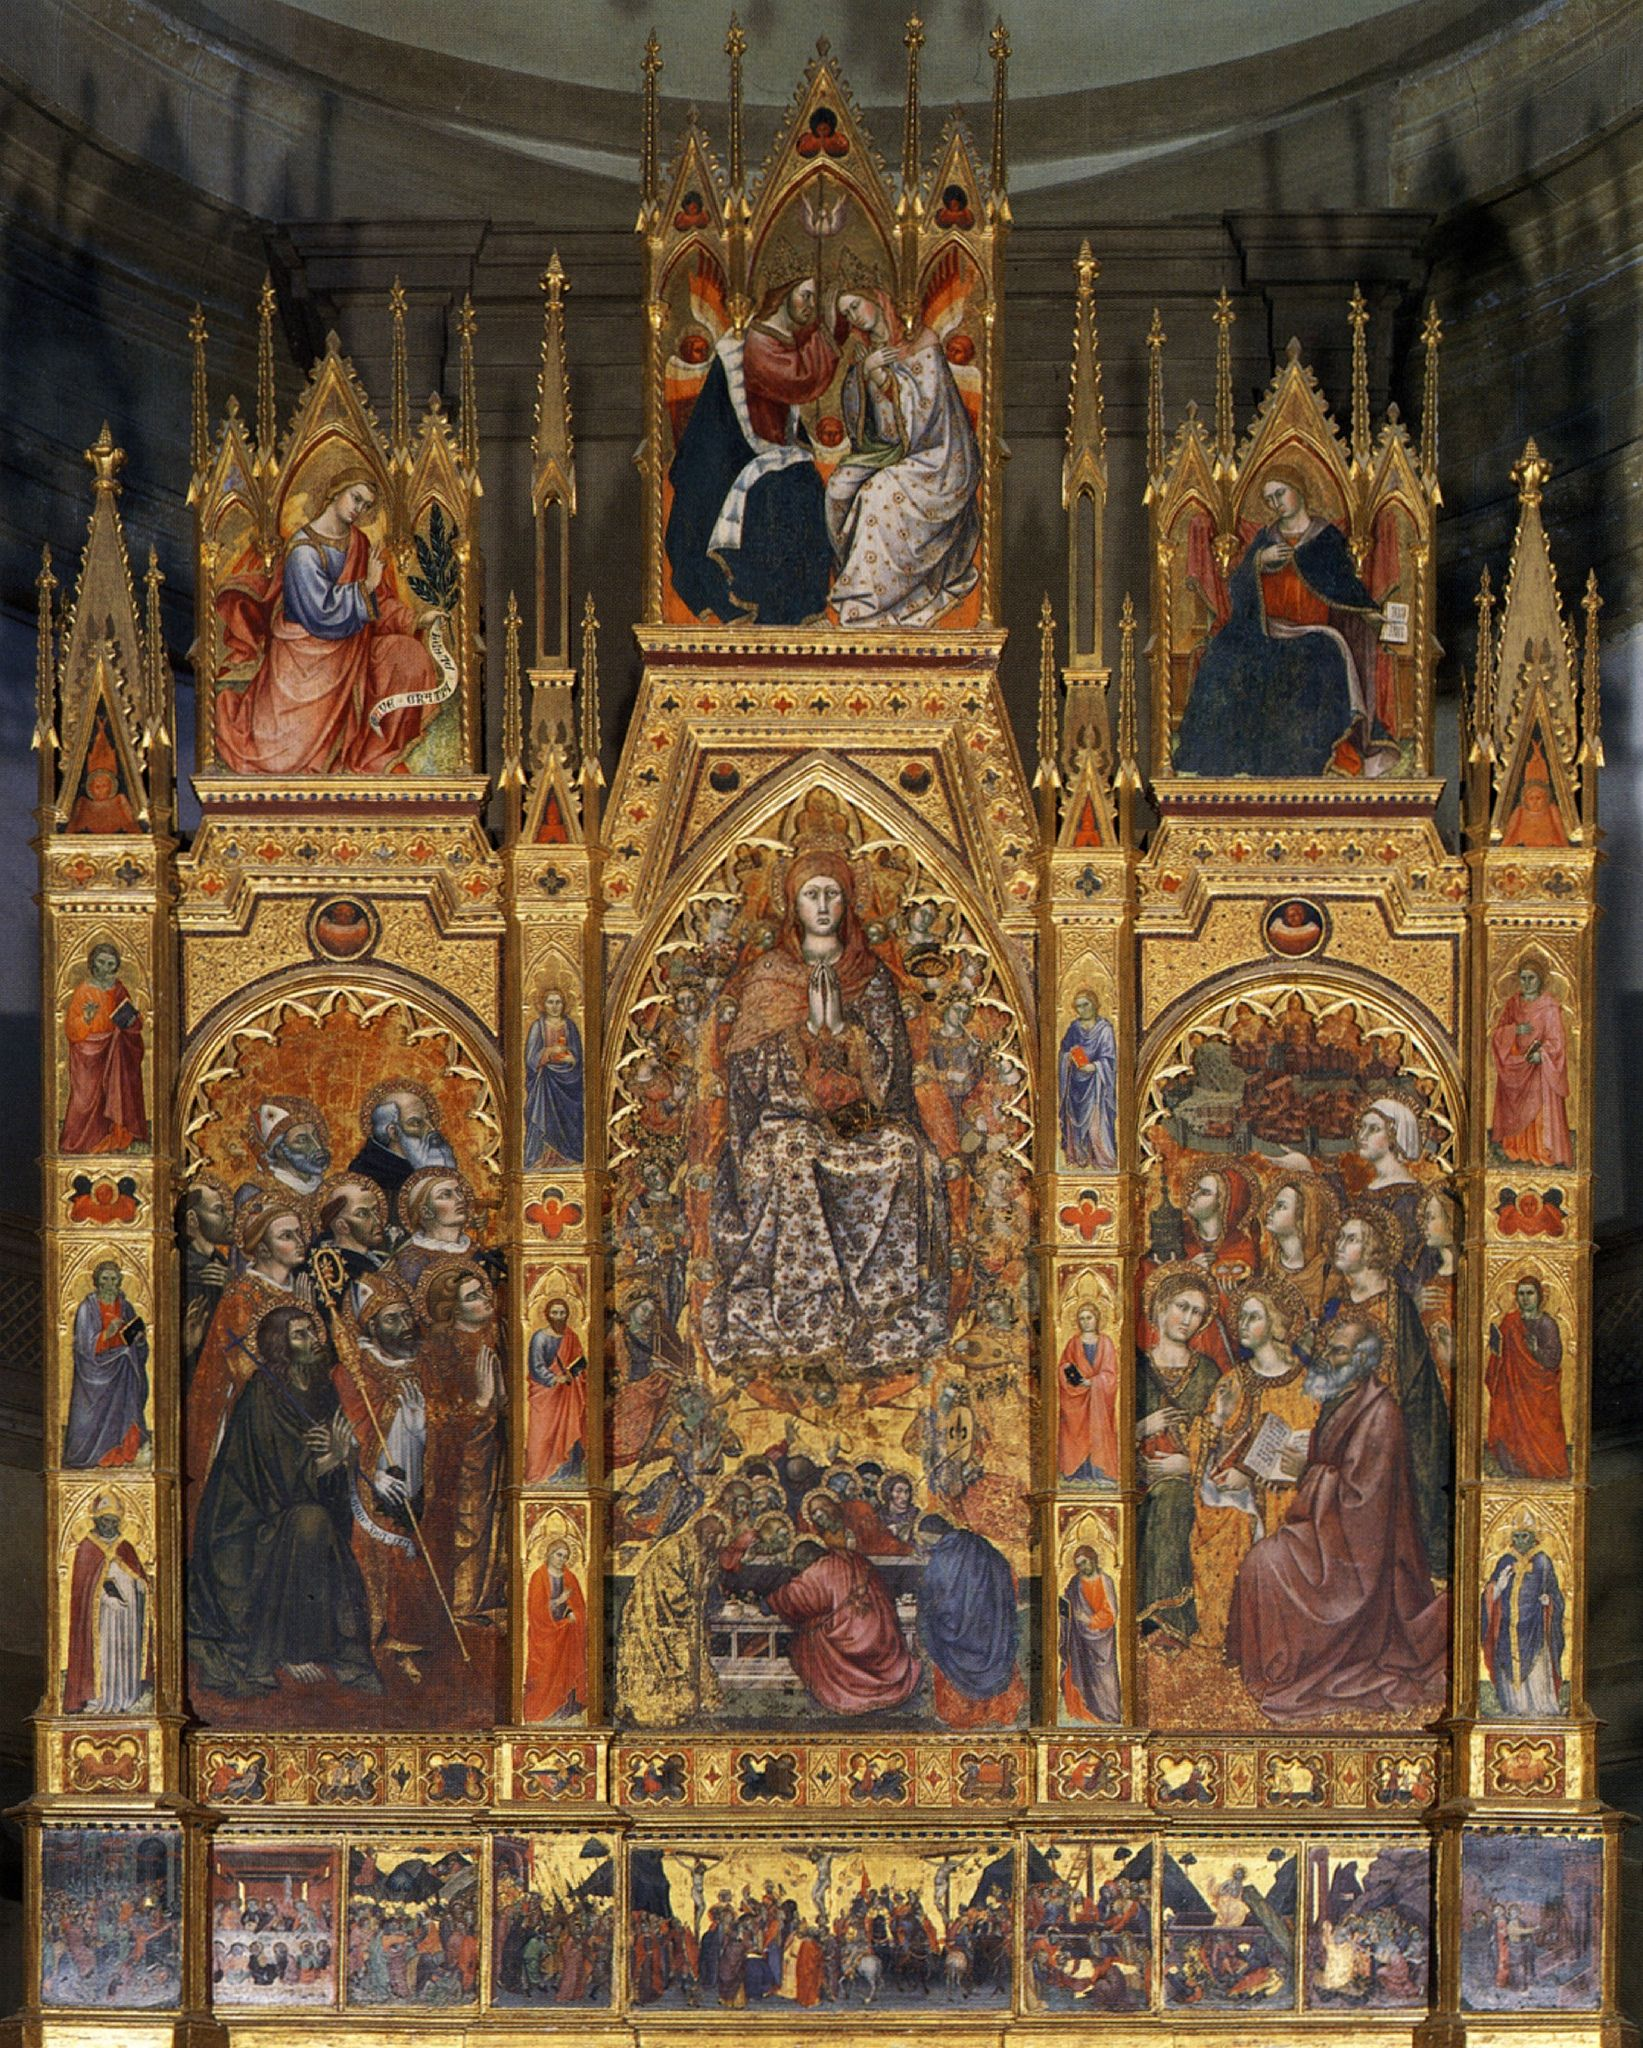 Bartolo,Taddeo di.Montepulciano.Duomo.high altar.Virgin of the Assumption and saints.c.1394-1401   par arthistory390